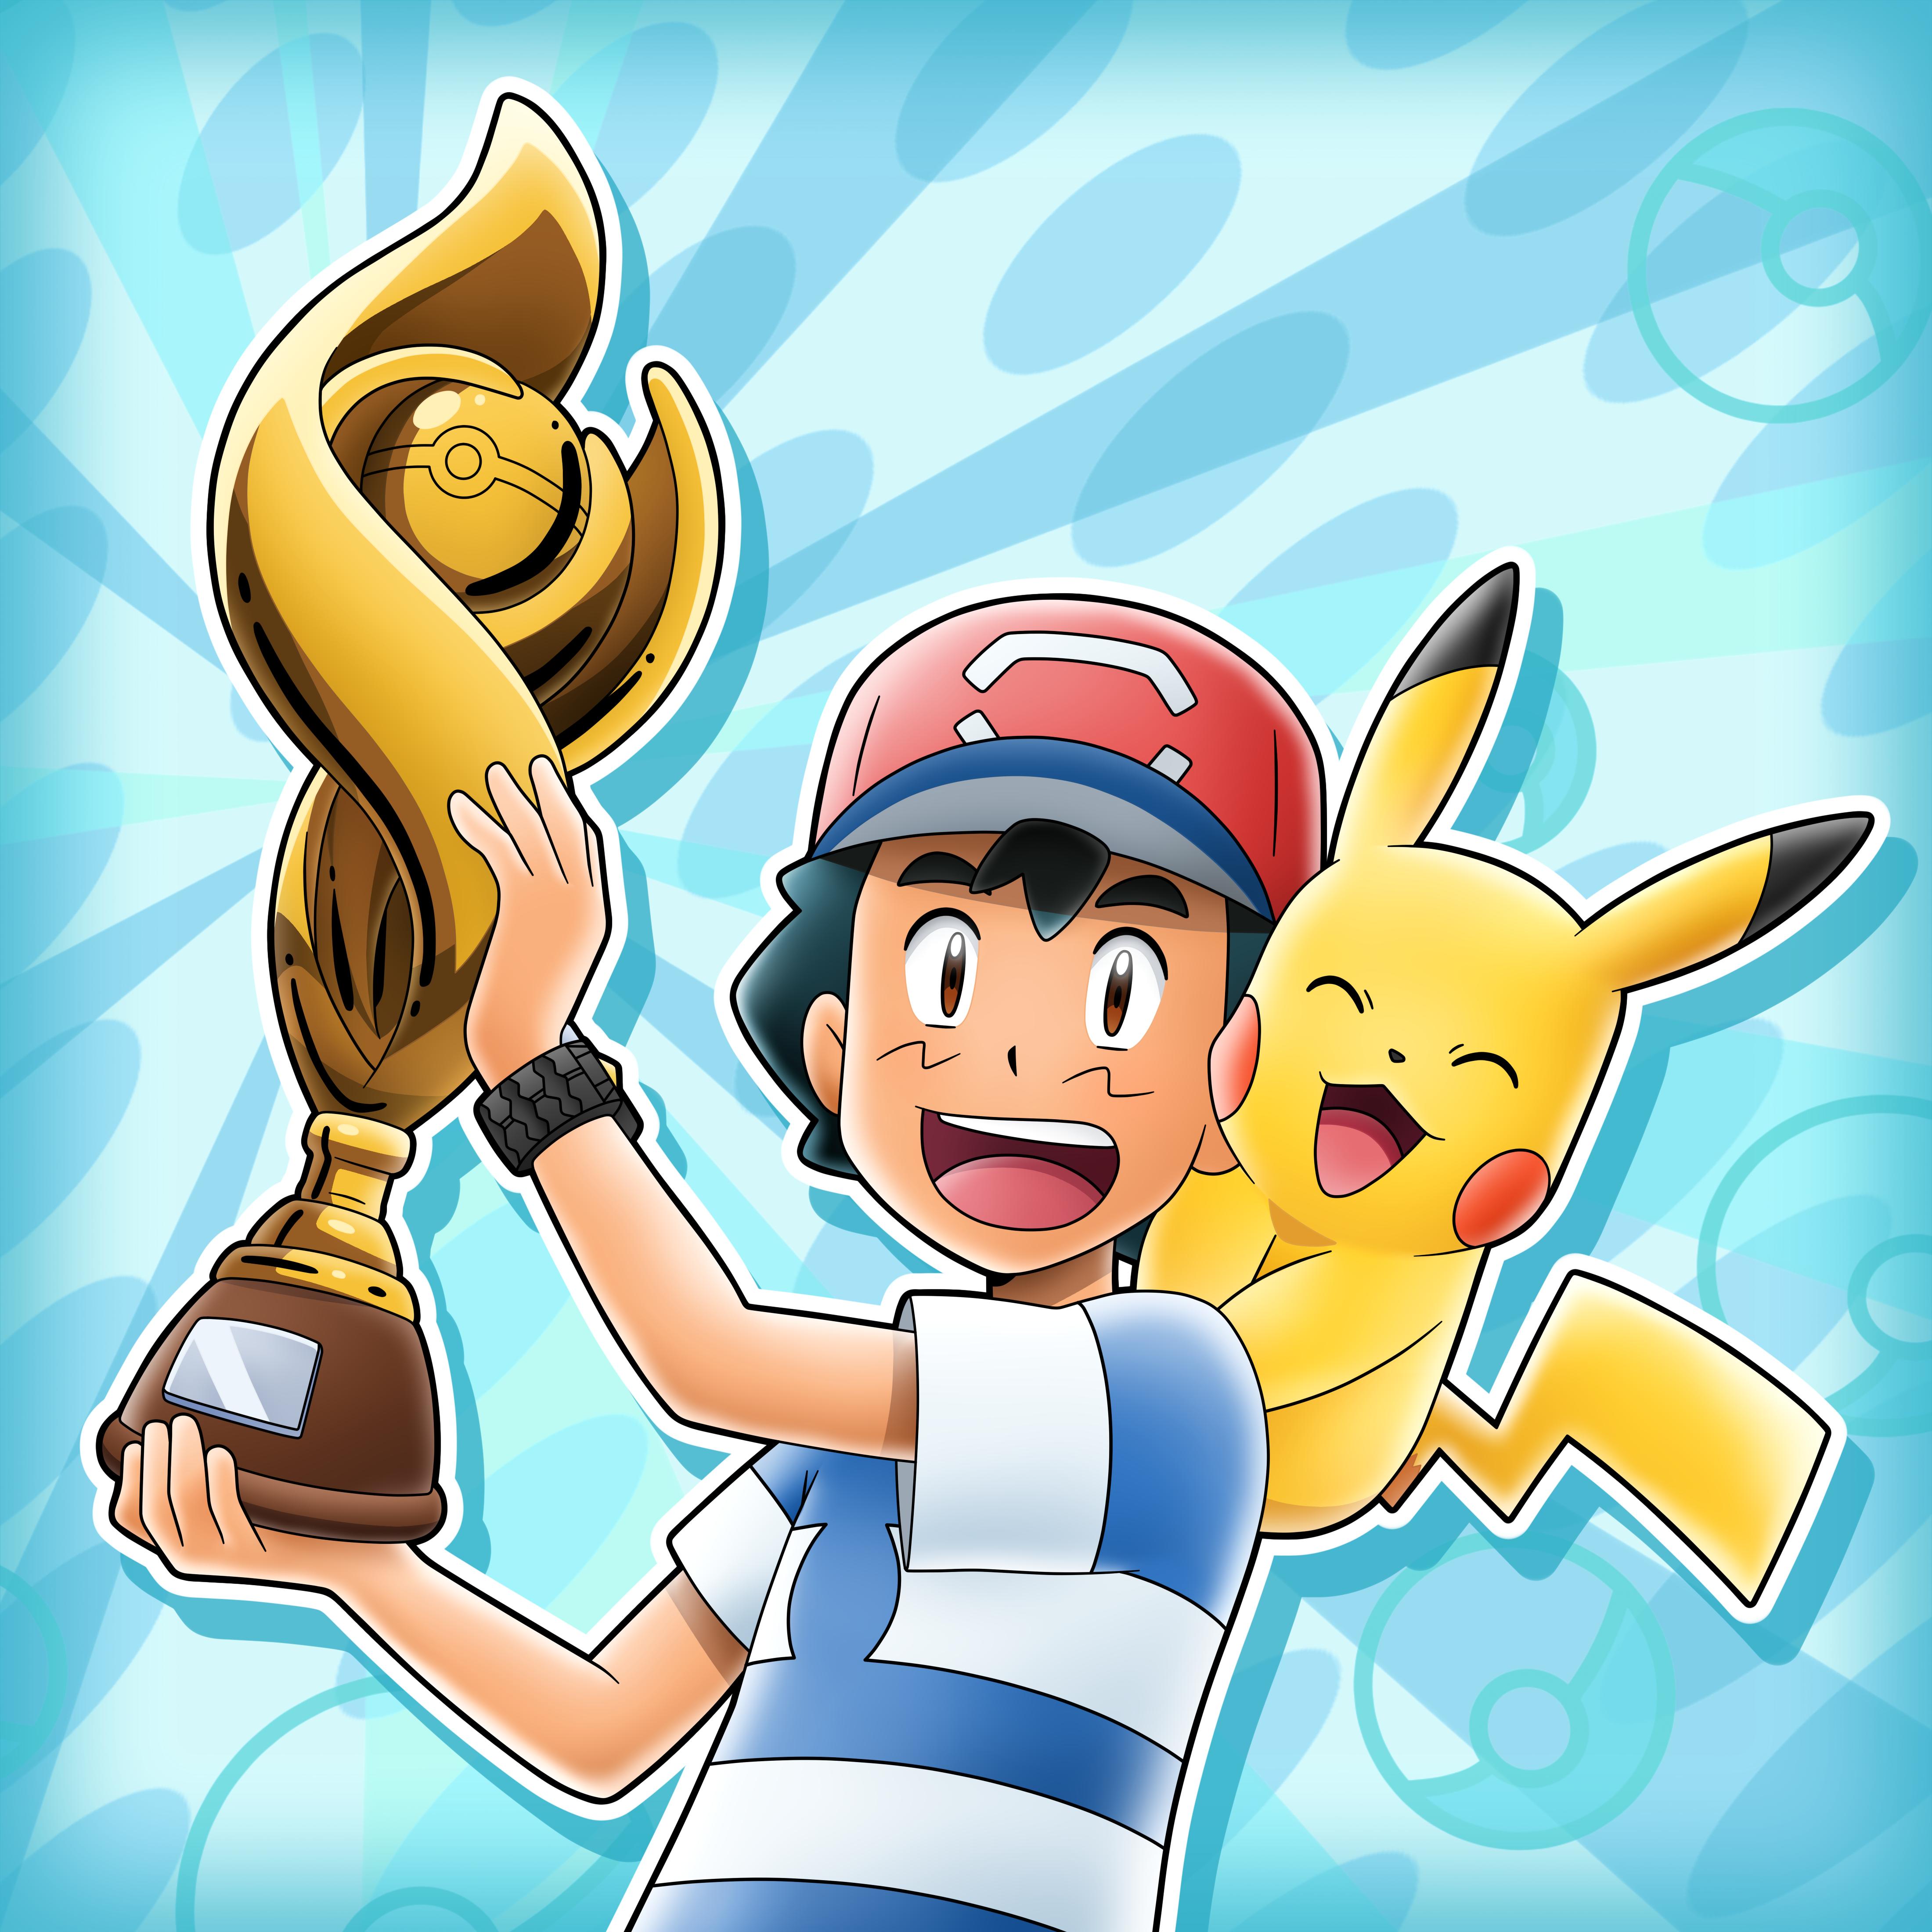 Champion Ash Ketchum by mcgmark on DeviantArt | Pokemon charizard, Ash  pokemon, Pokemon alola